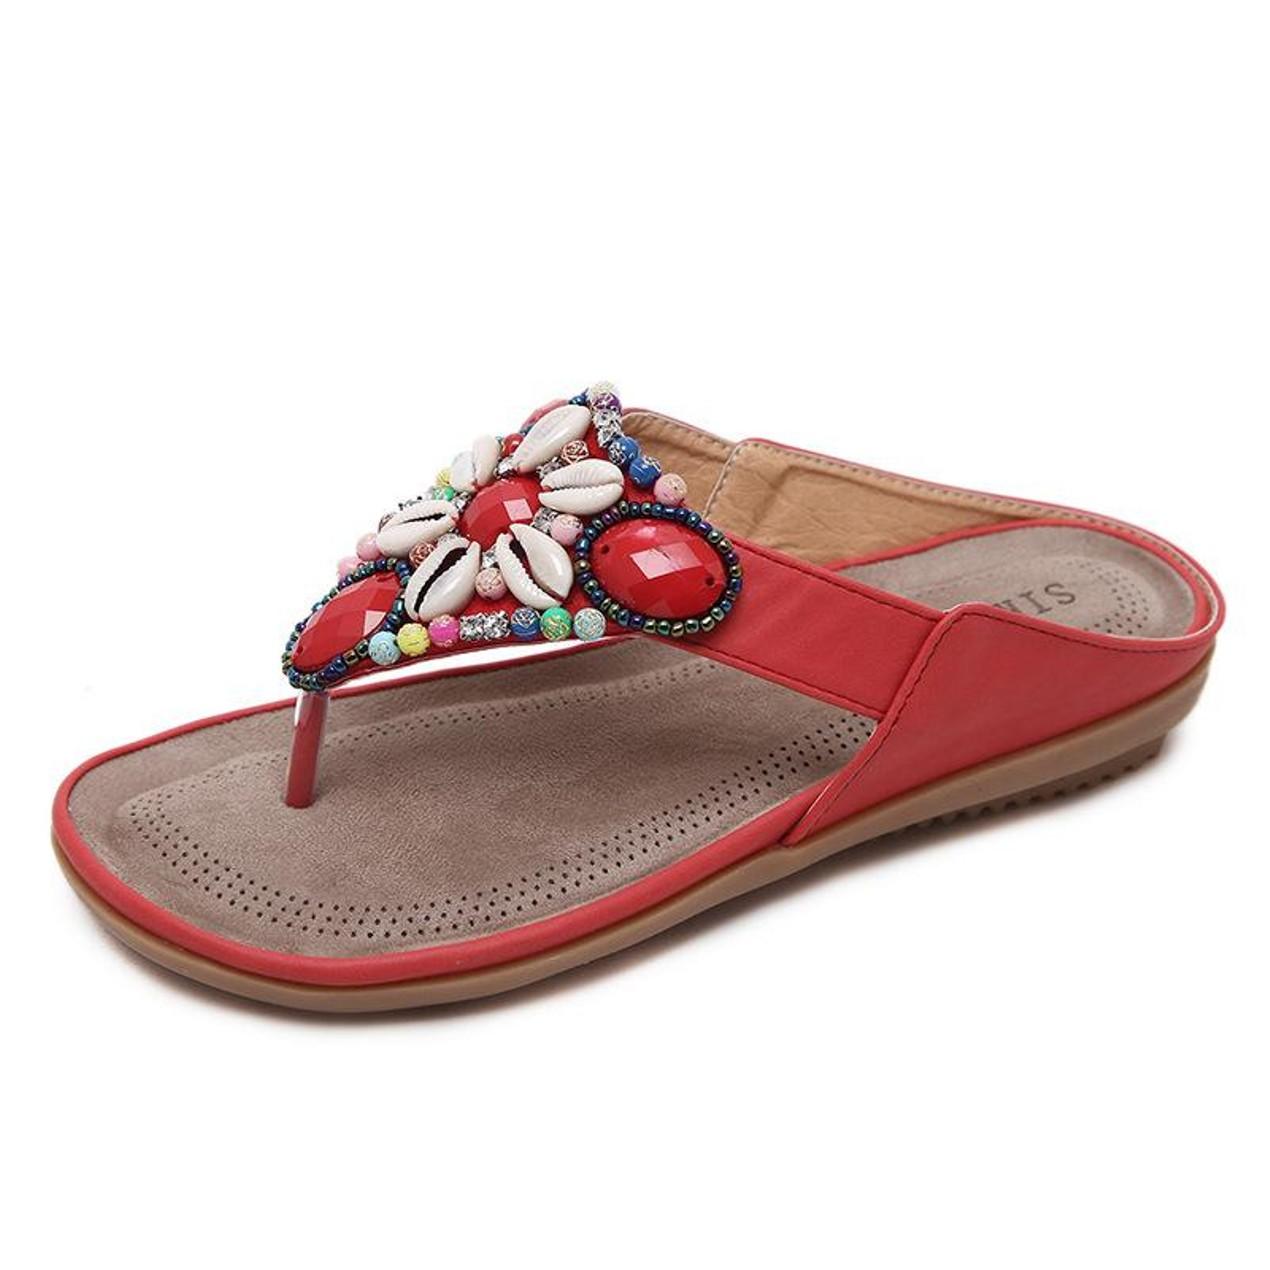 624370bcf Comfy sandals - Bohemia Flip Flops - Tanga